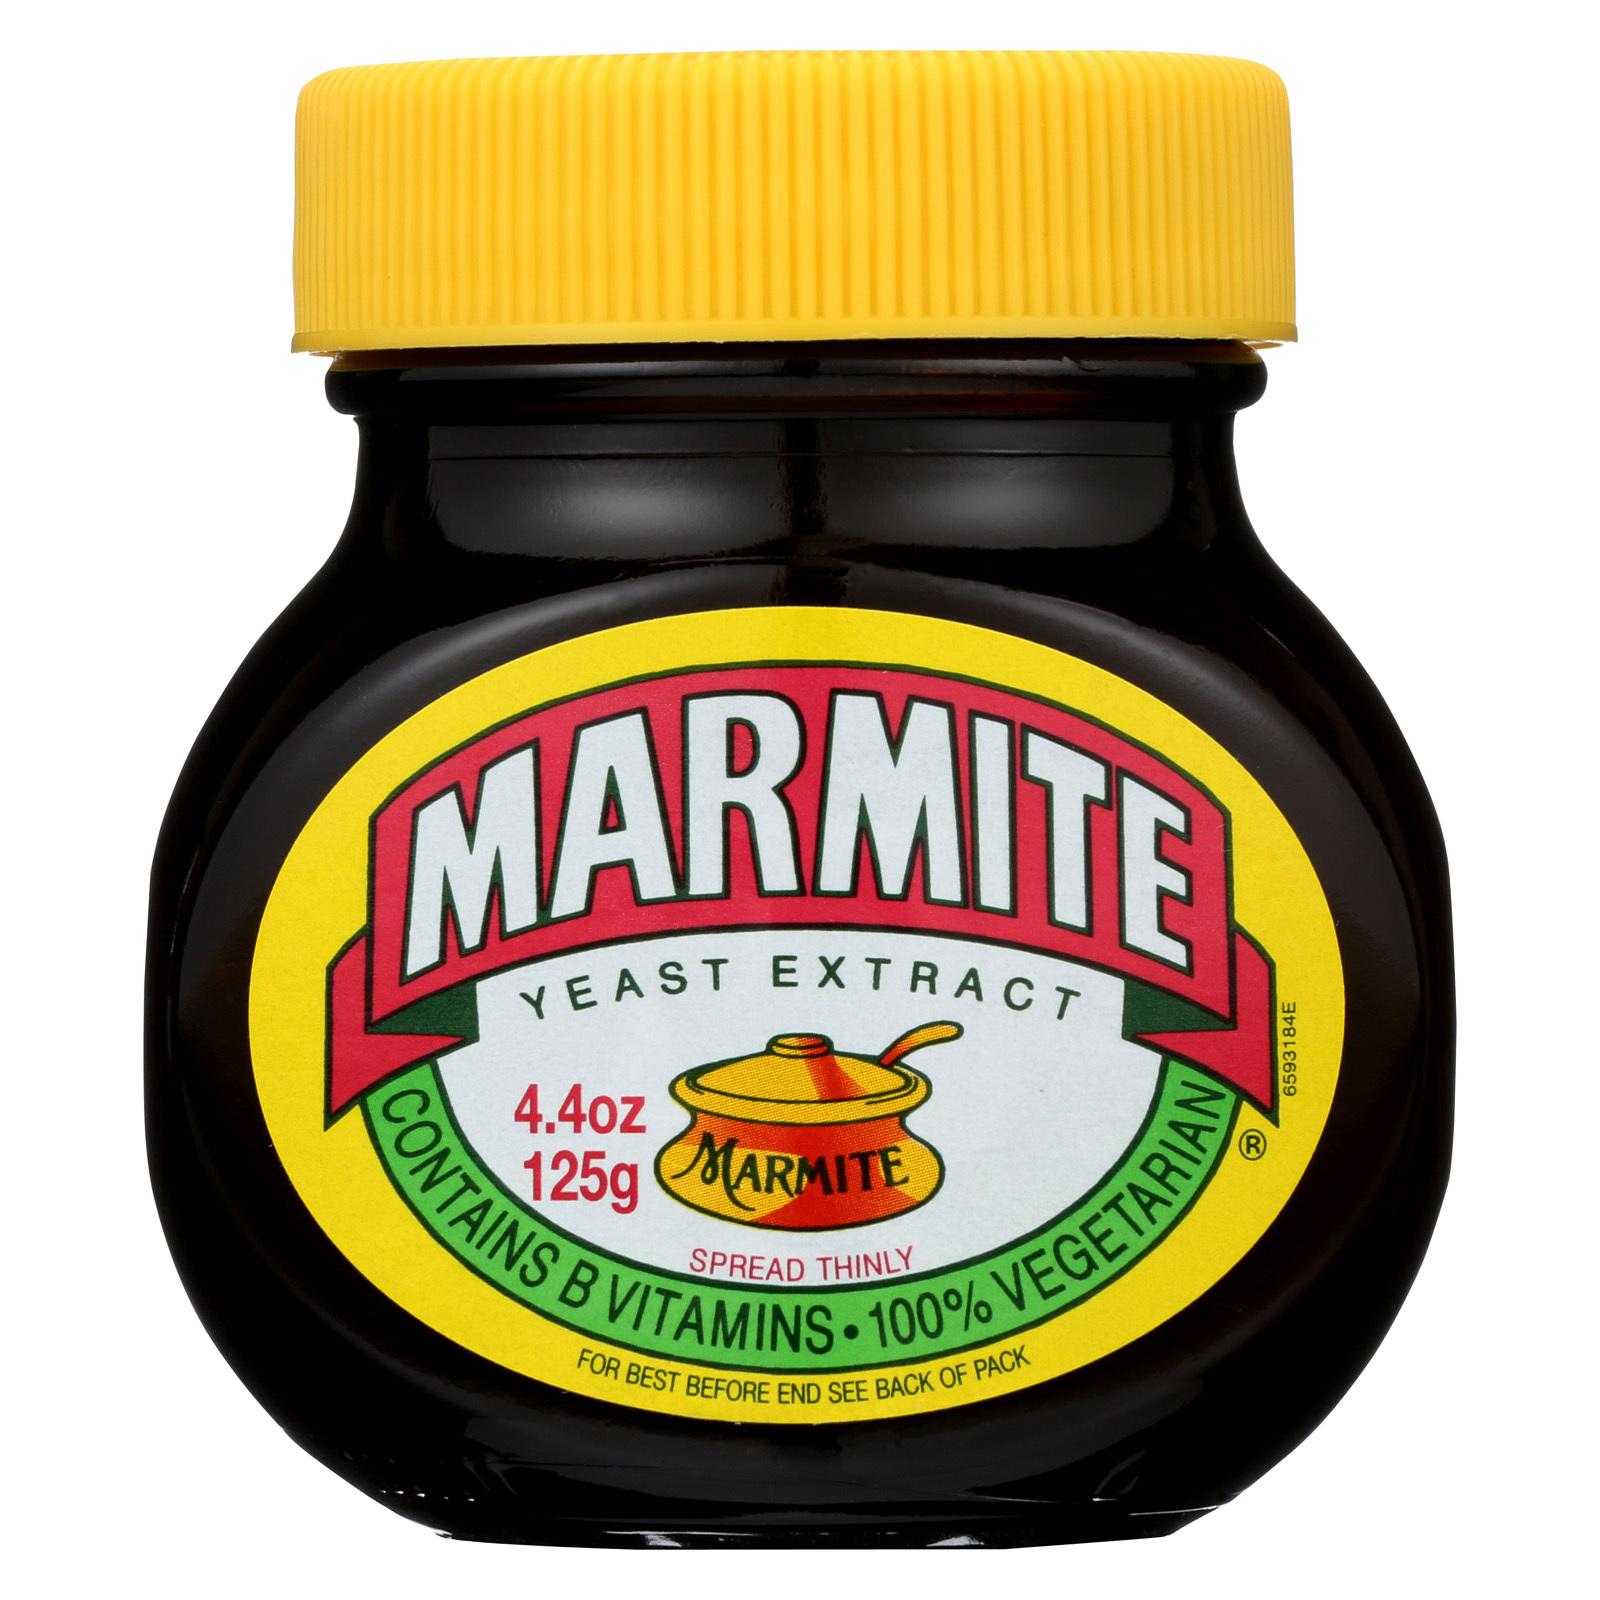 Marmite Yeast Extract - 4.4 oz.